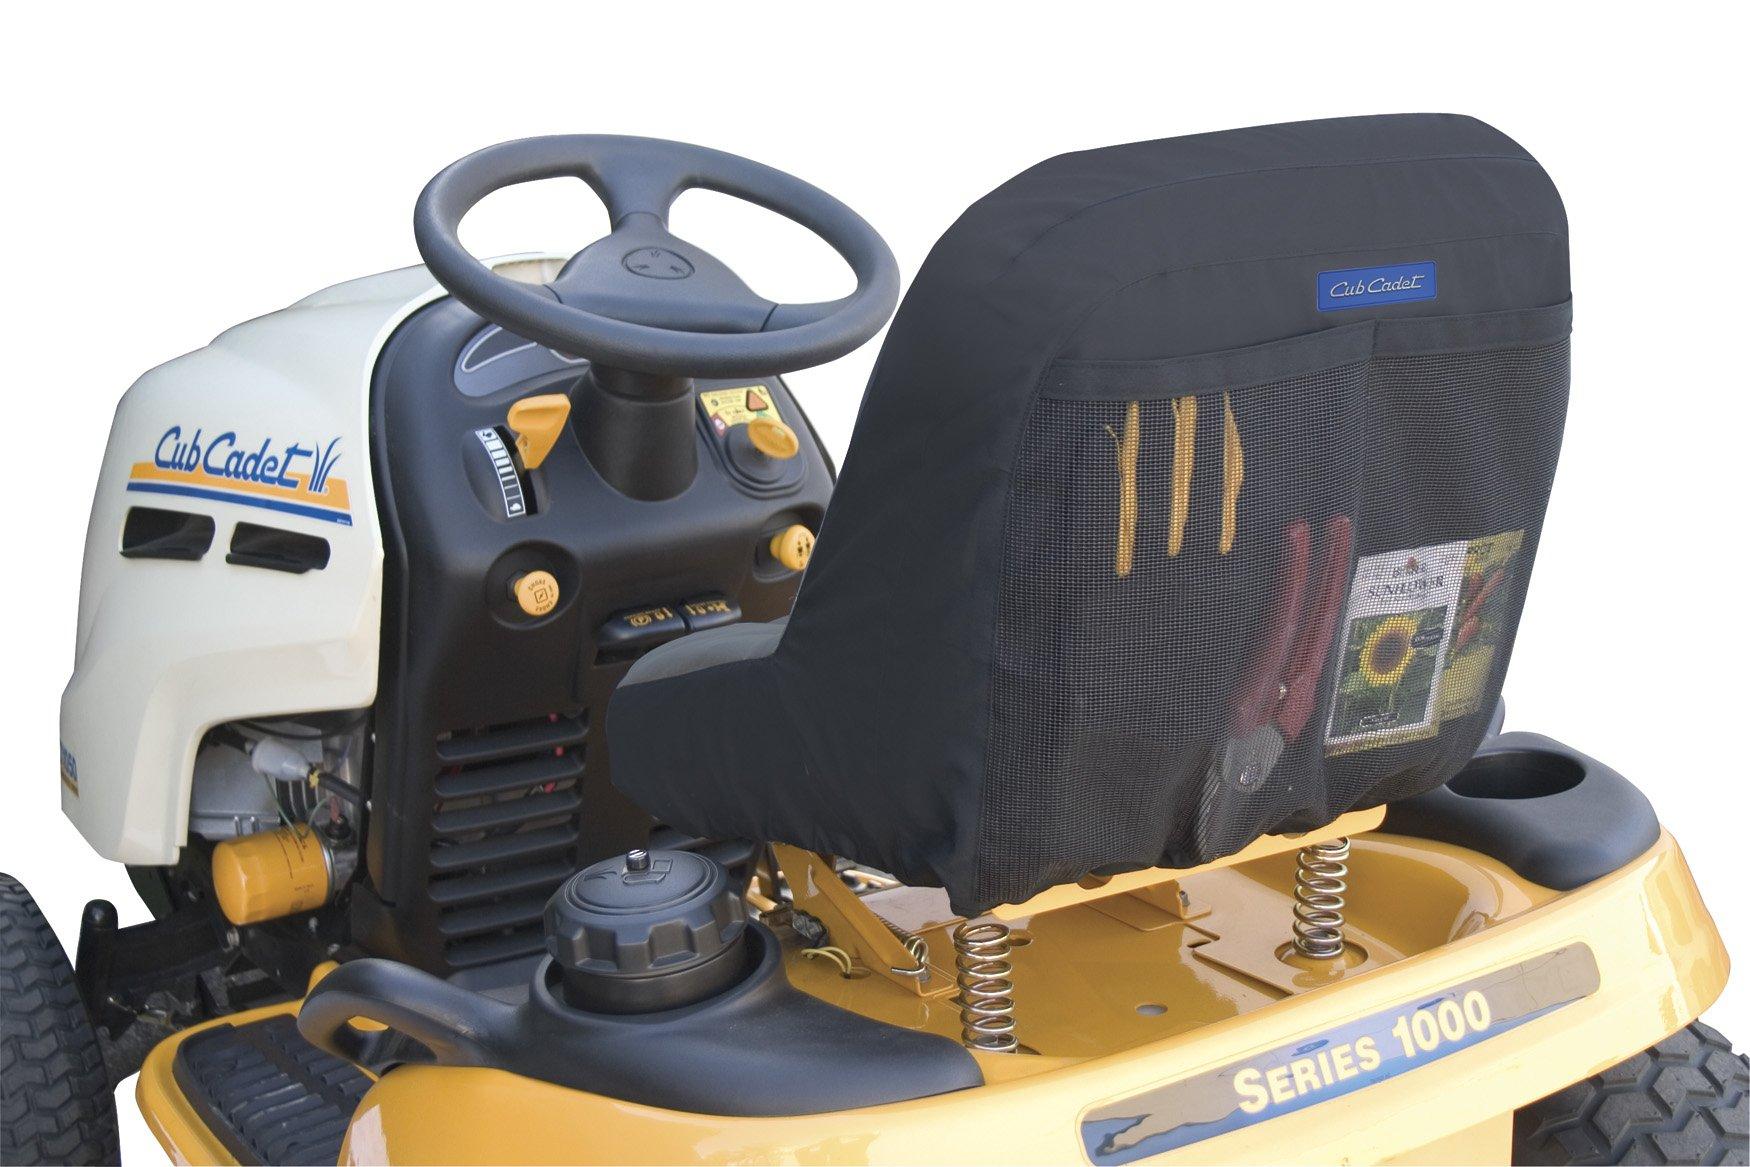 Cub Cadet 49233 Lawn Tractor Seat Cover, Size : Medium